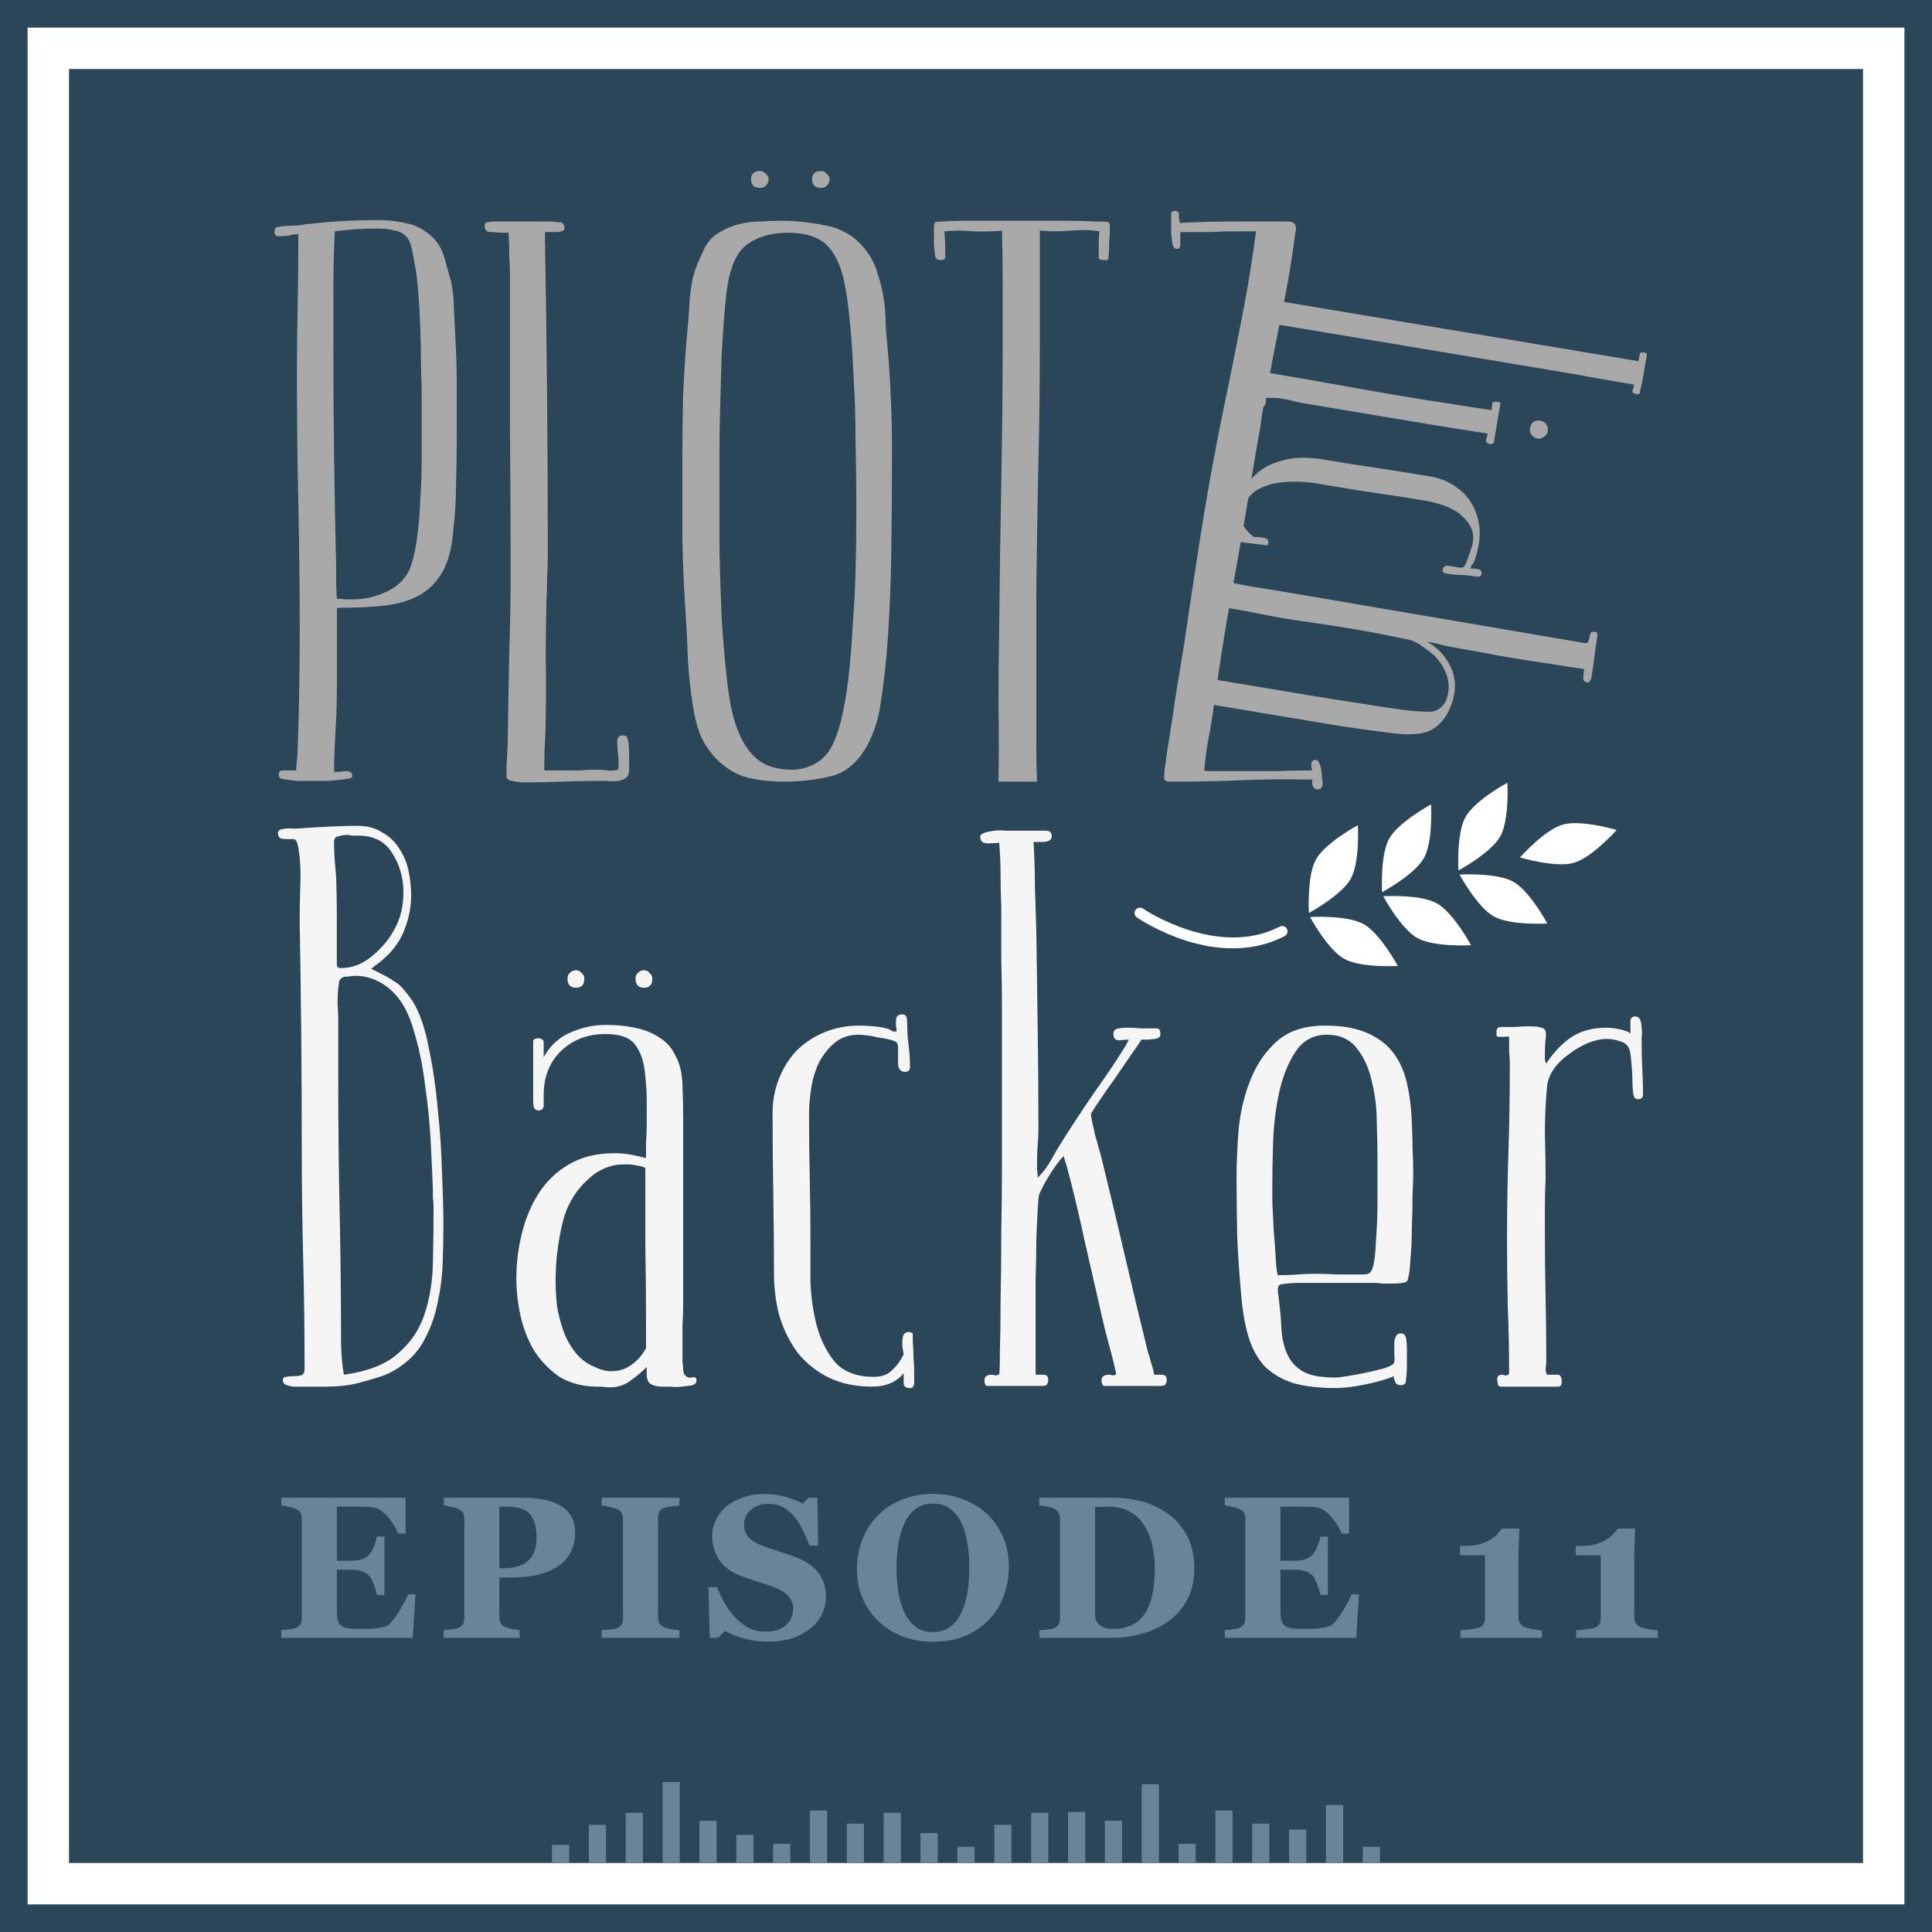 Podcast   Episode 20   Interview mit Jeffrey Hamelman   Plötzblog ...